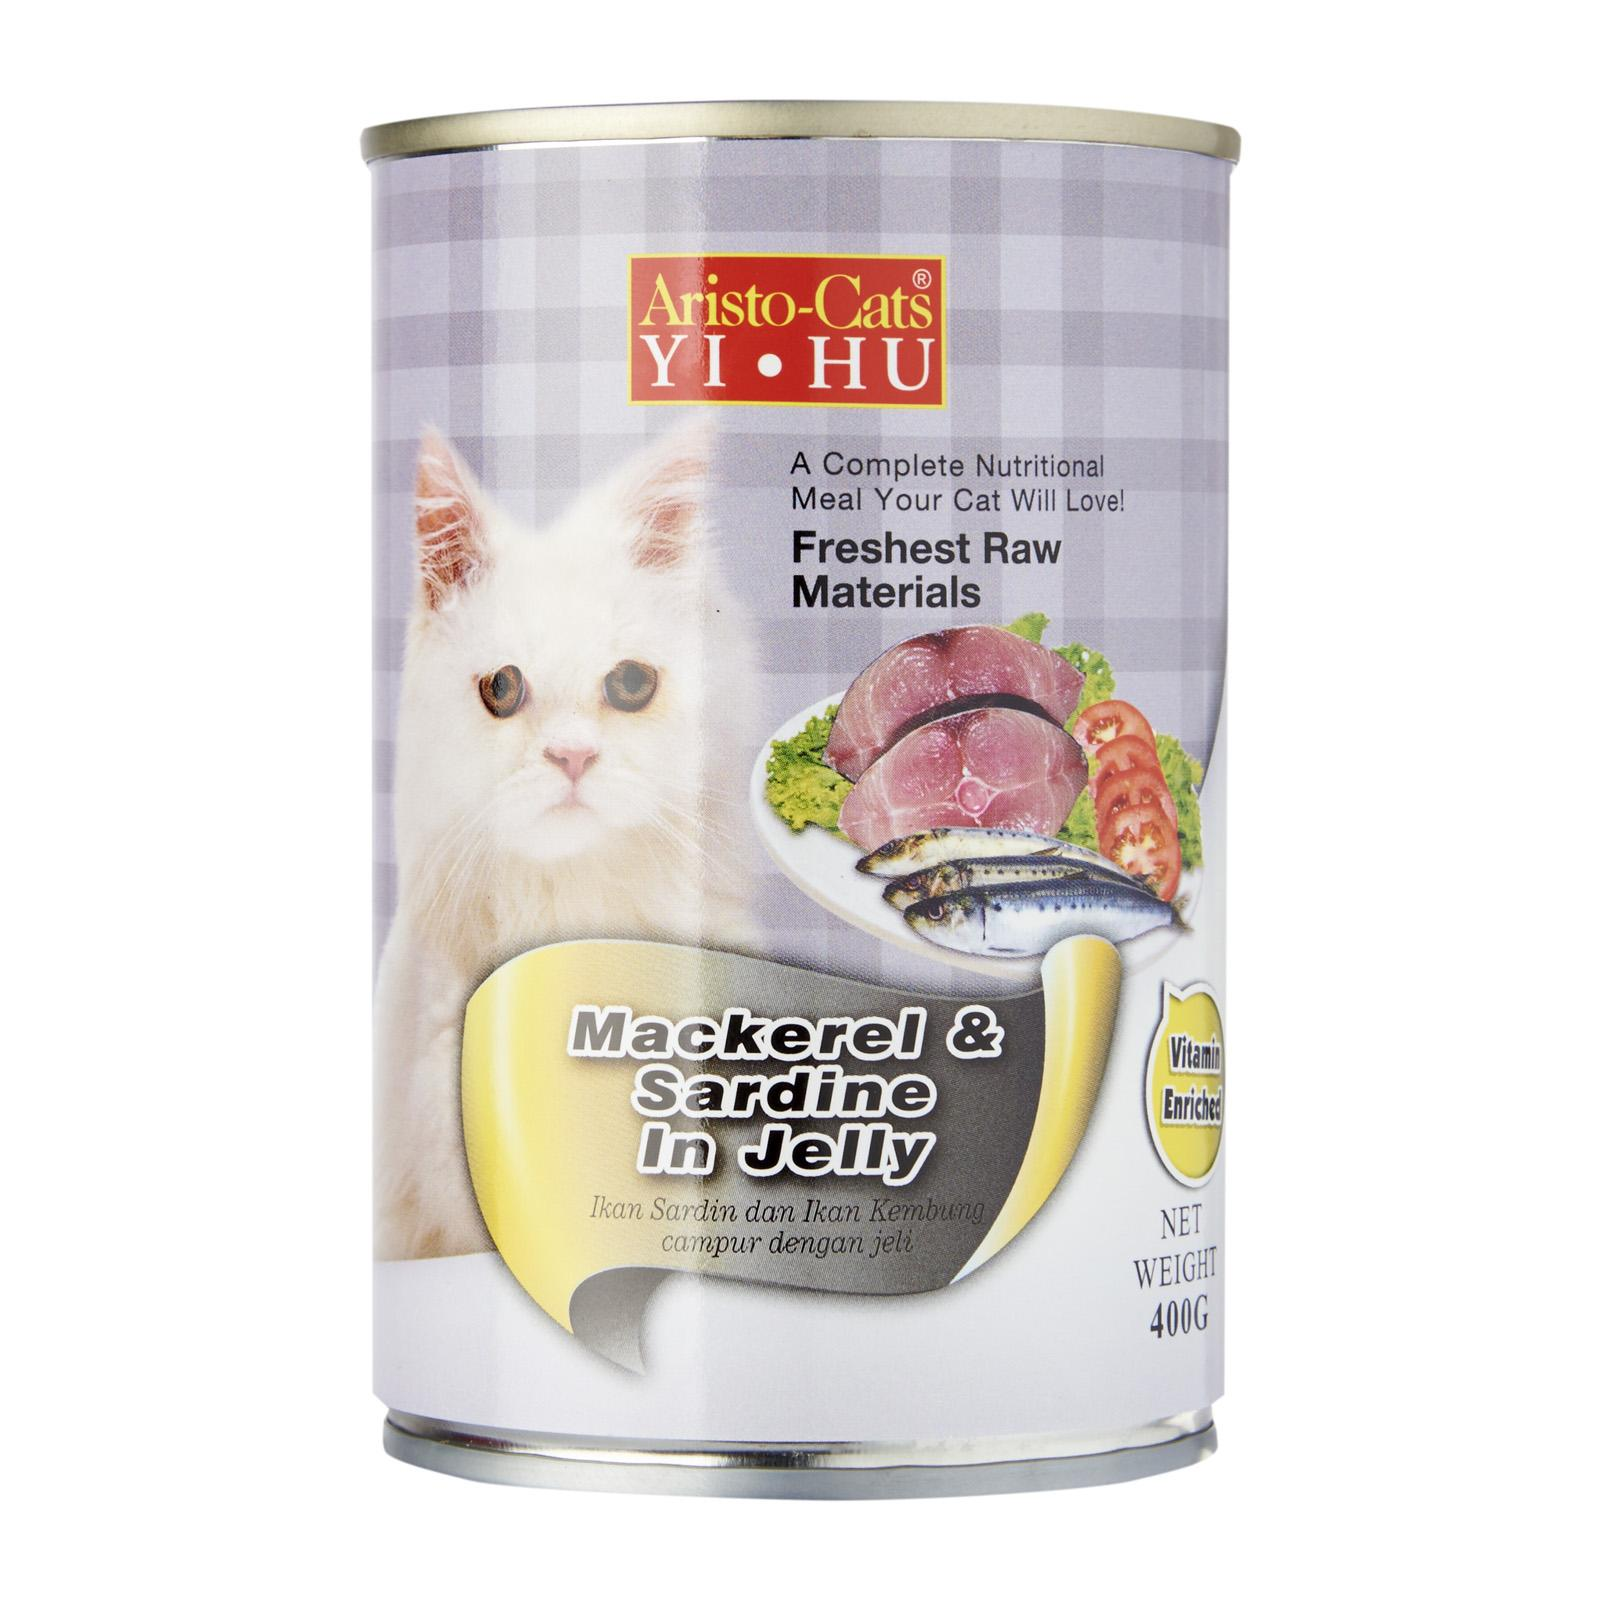 Aristo-Cats Yi Hu Mackerel And Sardine In Jelly Wet Cat Food